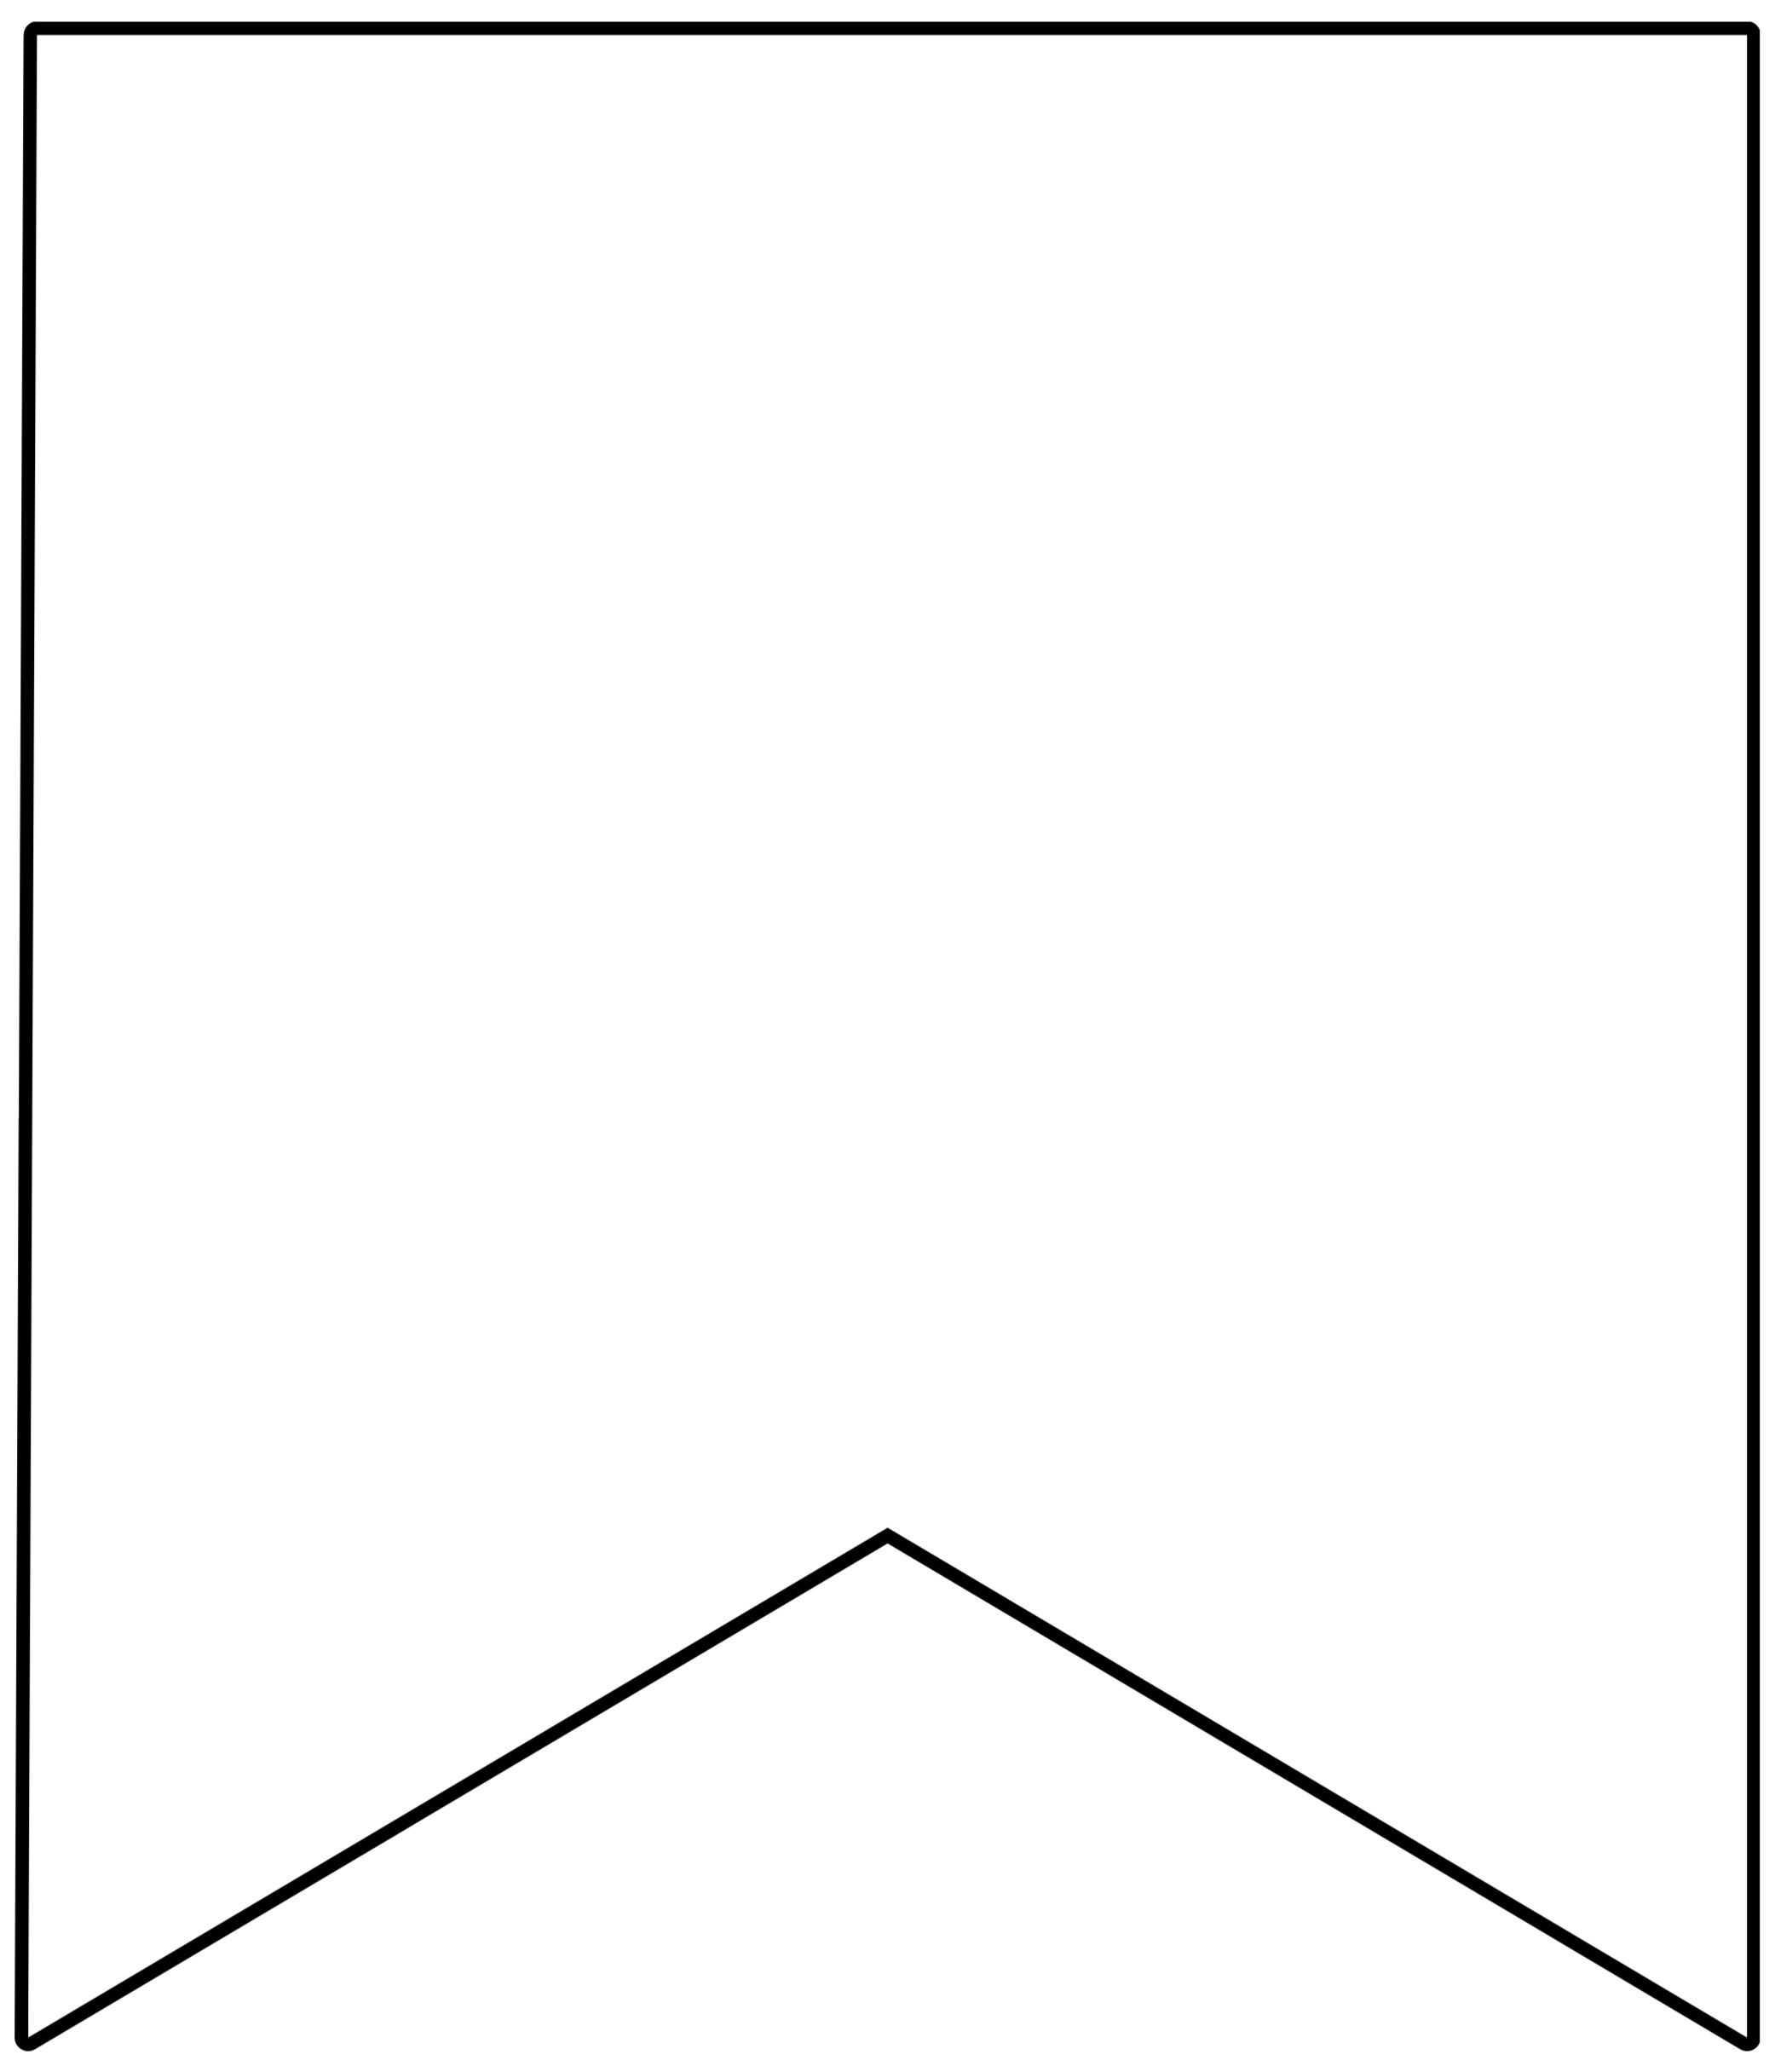 Template Printable Pennant Banner - Epp Acp   Free For Printable Pennant Banner Template Free